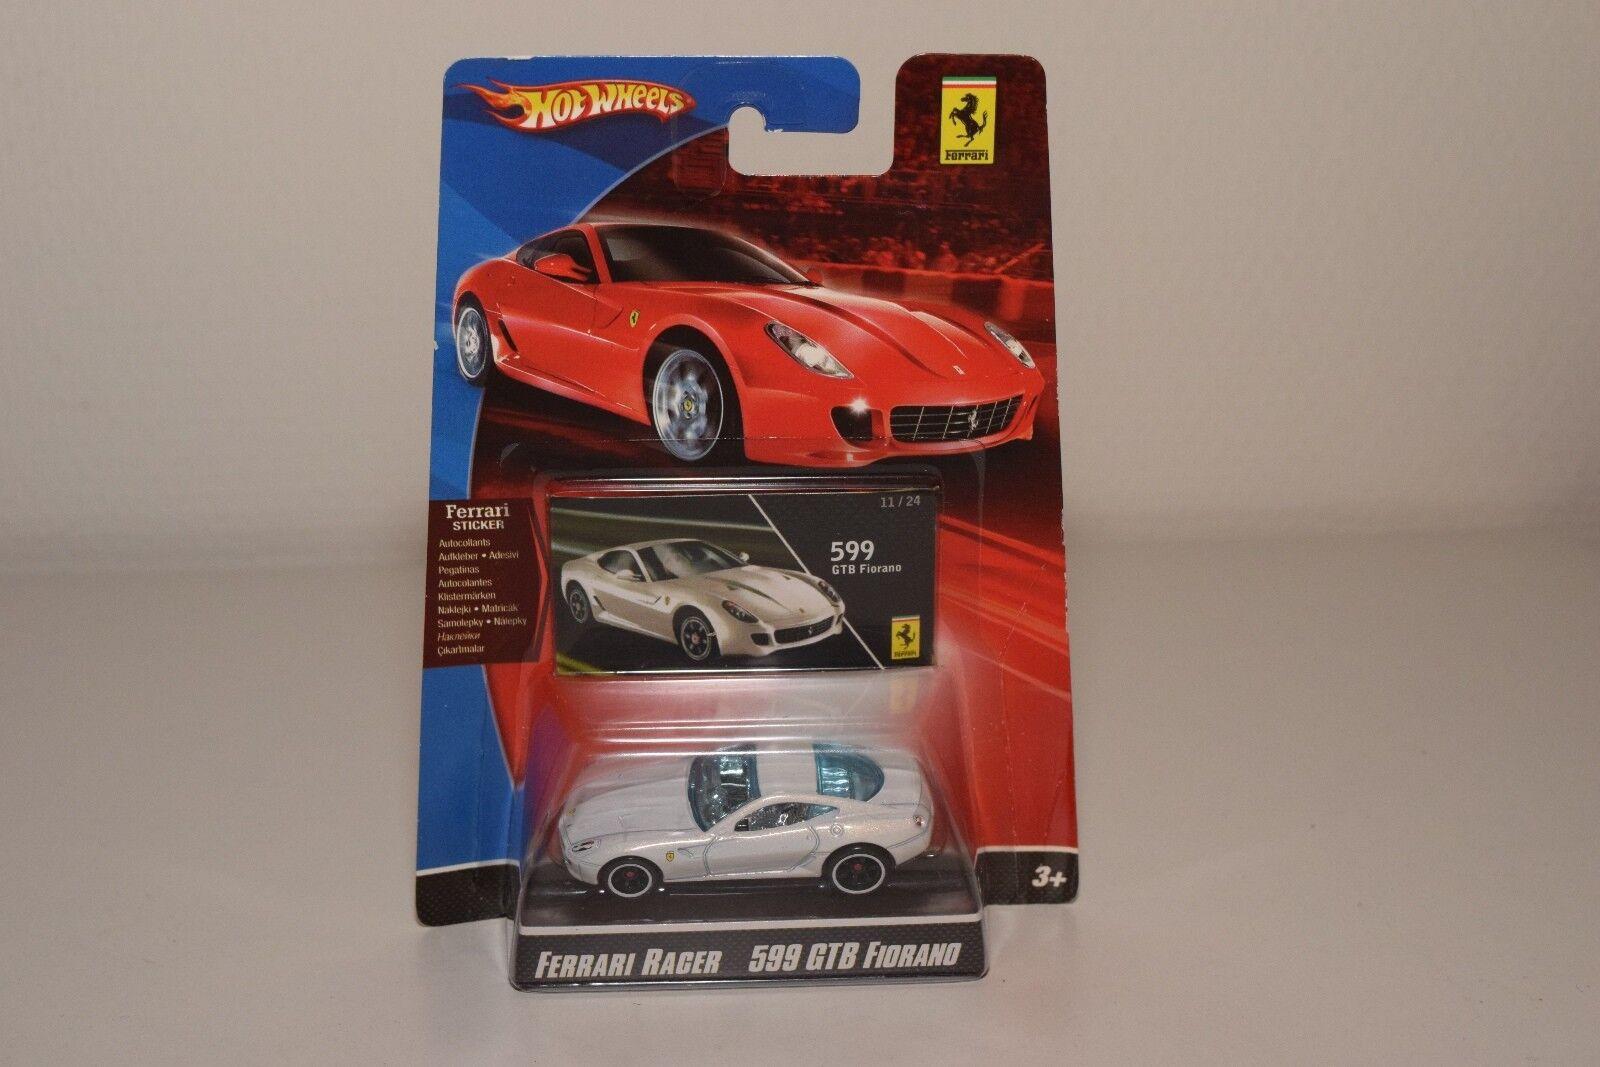 V 1 64 HOTWHEELS RACER FERRARI 599 GTB 599GTB FIORANO blanc MINT ON CARD RARE